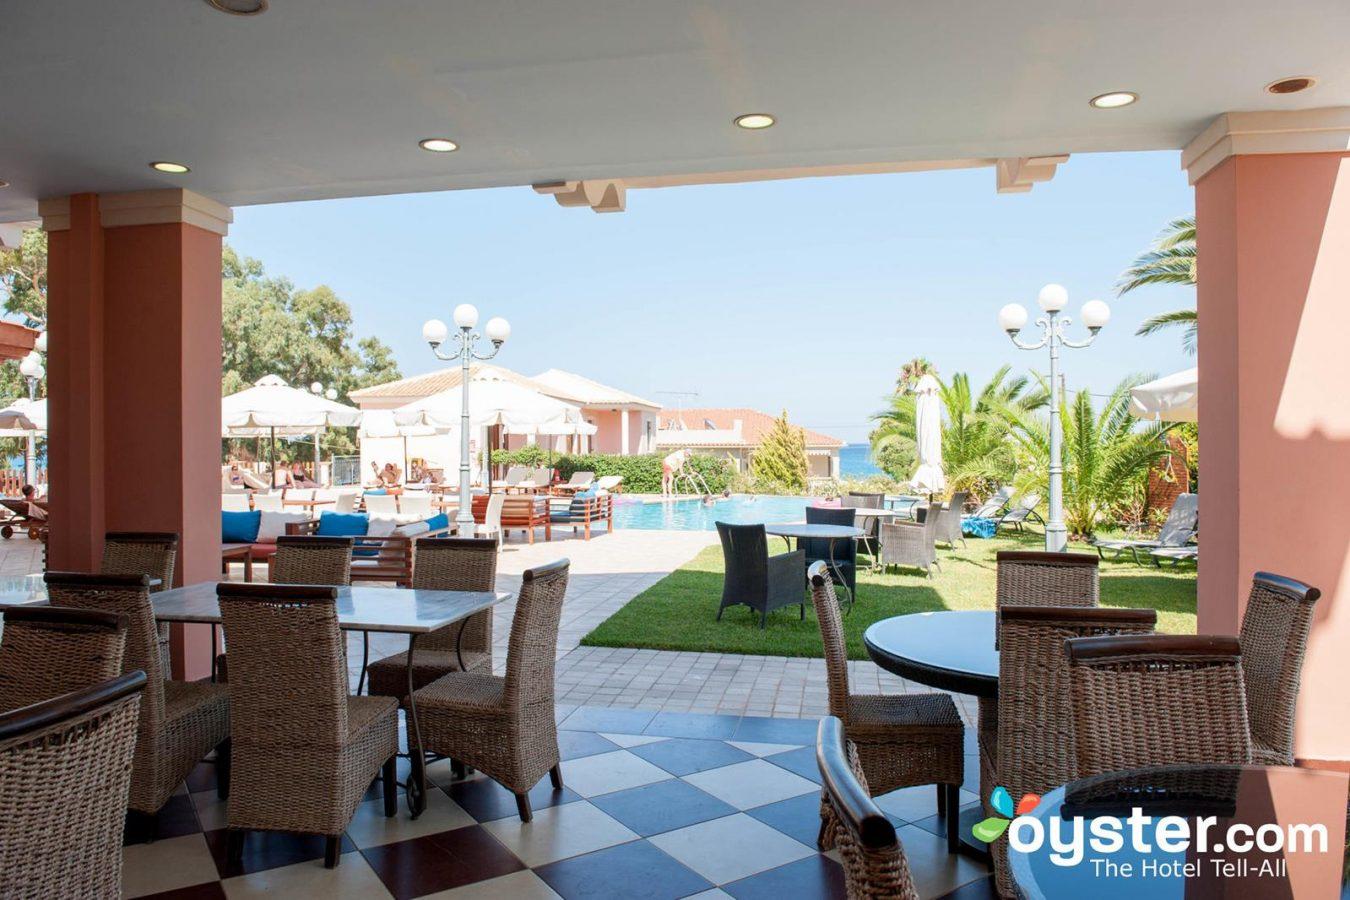 Hotel restaurant in Skala Kefalonia - Melidron Hotel Kefalonia